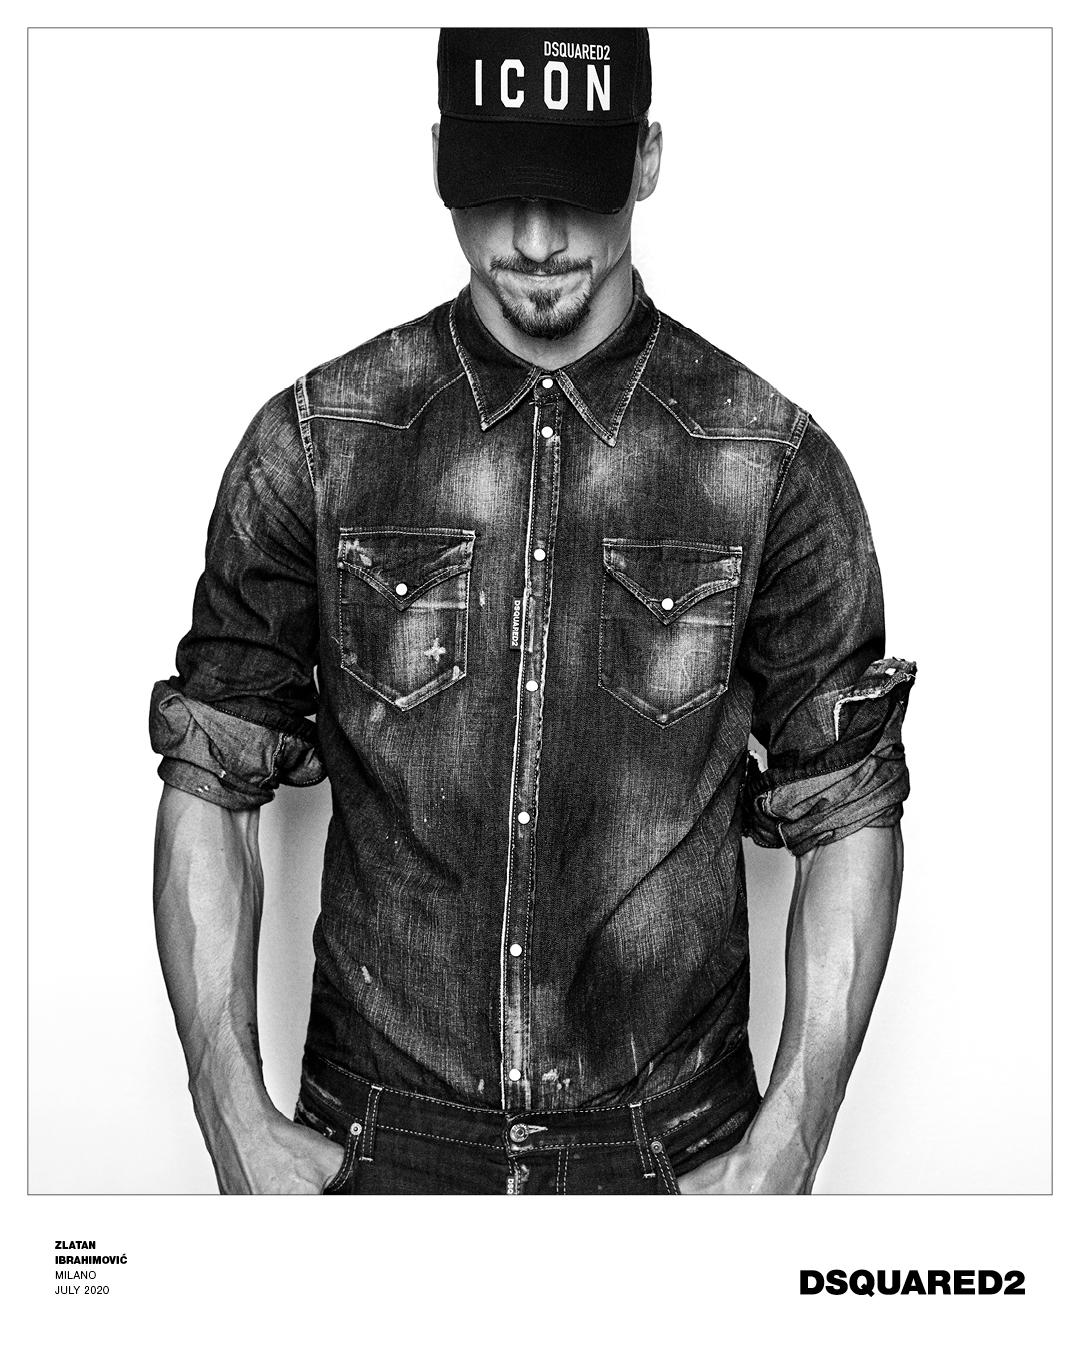 Dsquared2 Zlatan Ibrahimovic Spring 2021 Ad Campaign